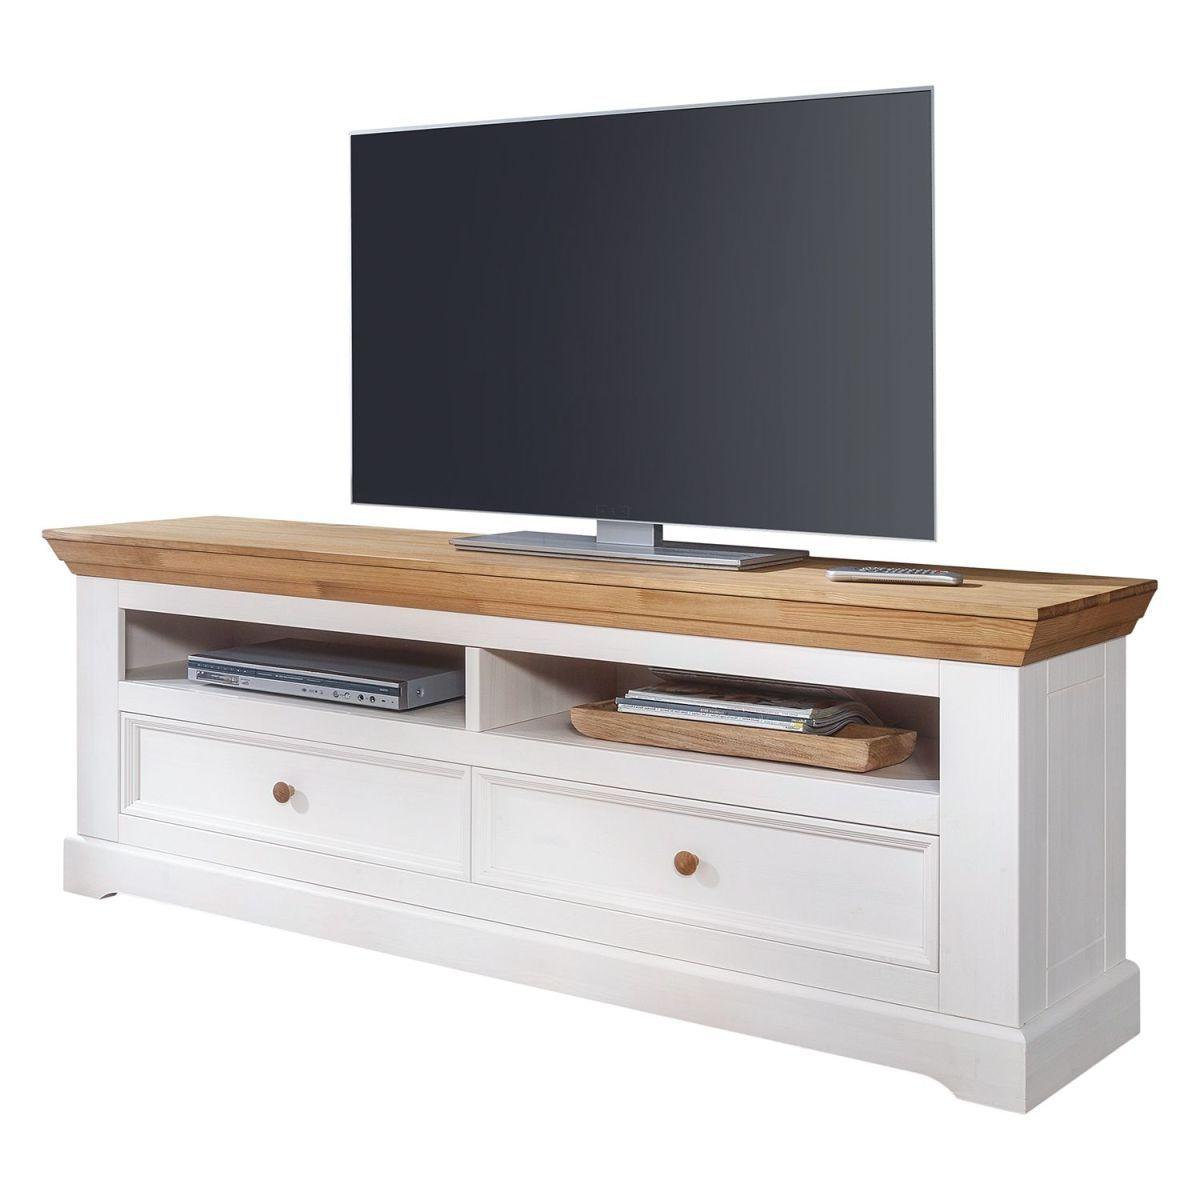 Pin By Ladendirekt On Tv Hifi Möbel Cabinet Furniture